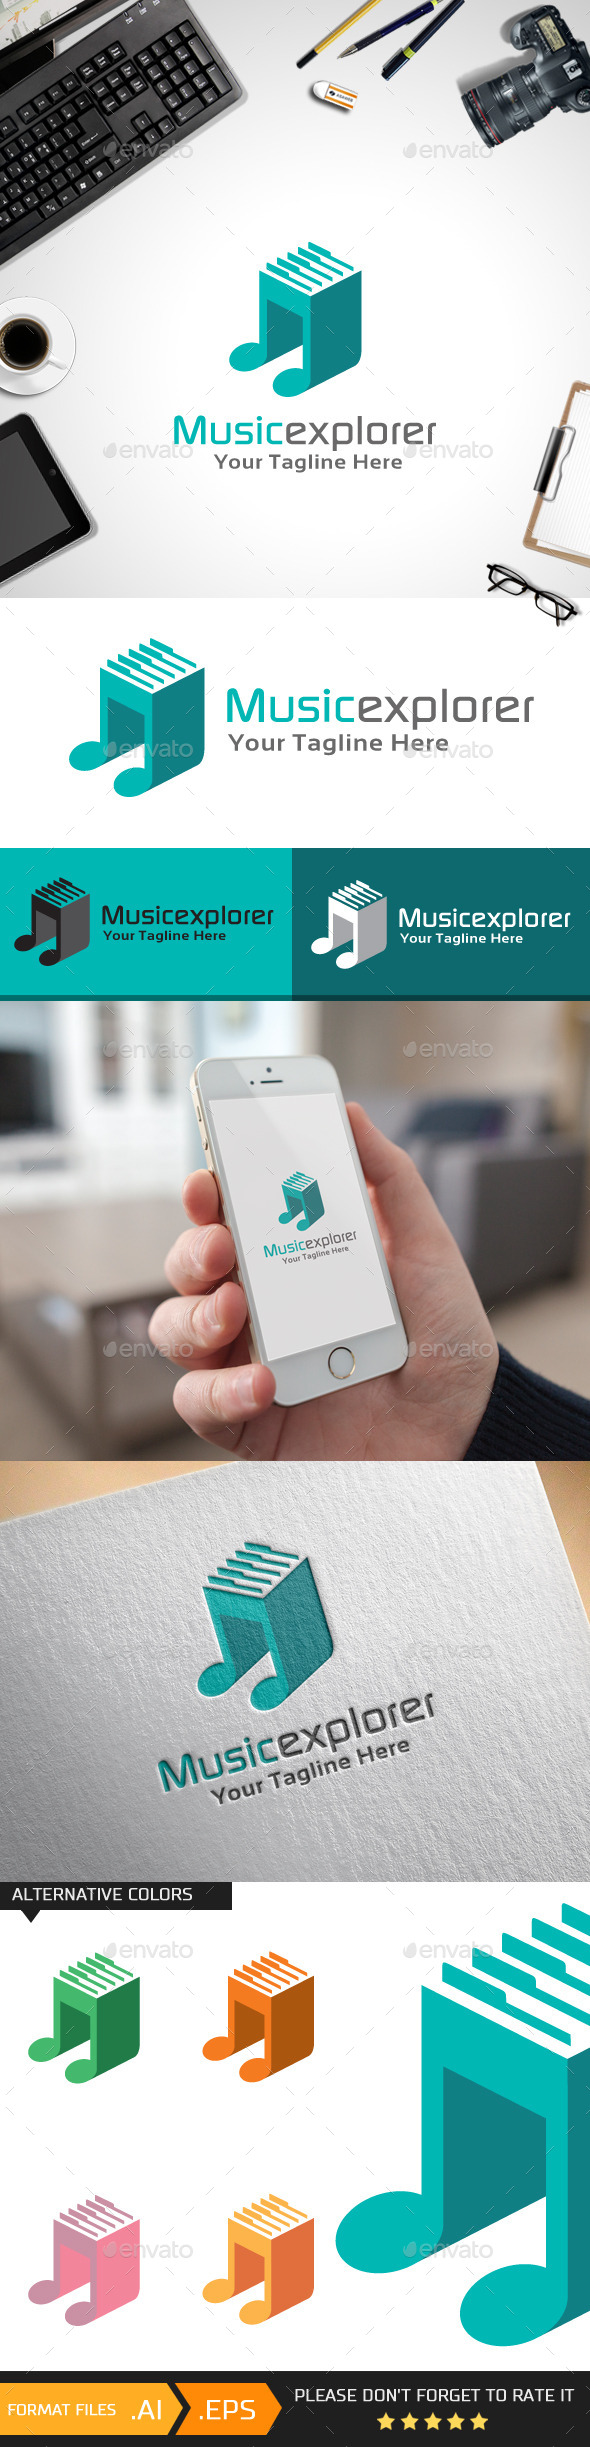 Musicexplorer Logo Template - Symbols Logo Templates